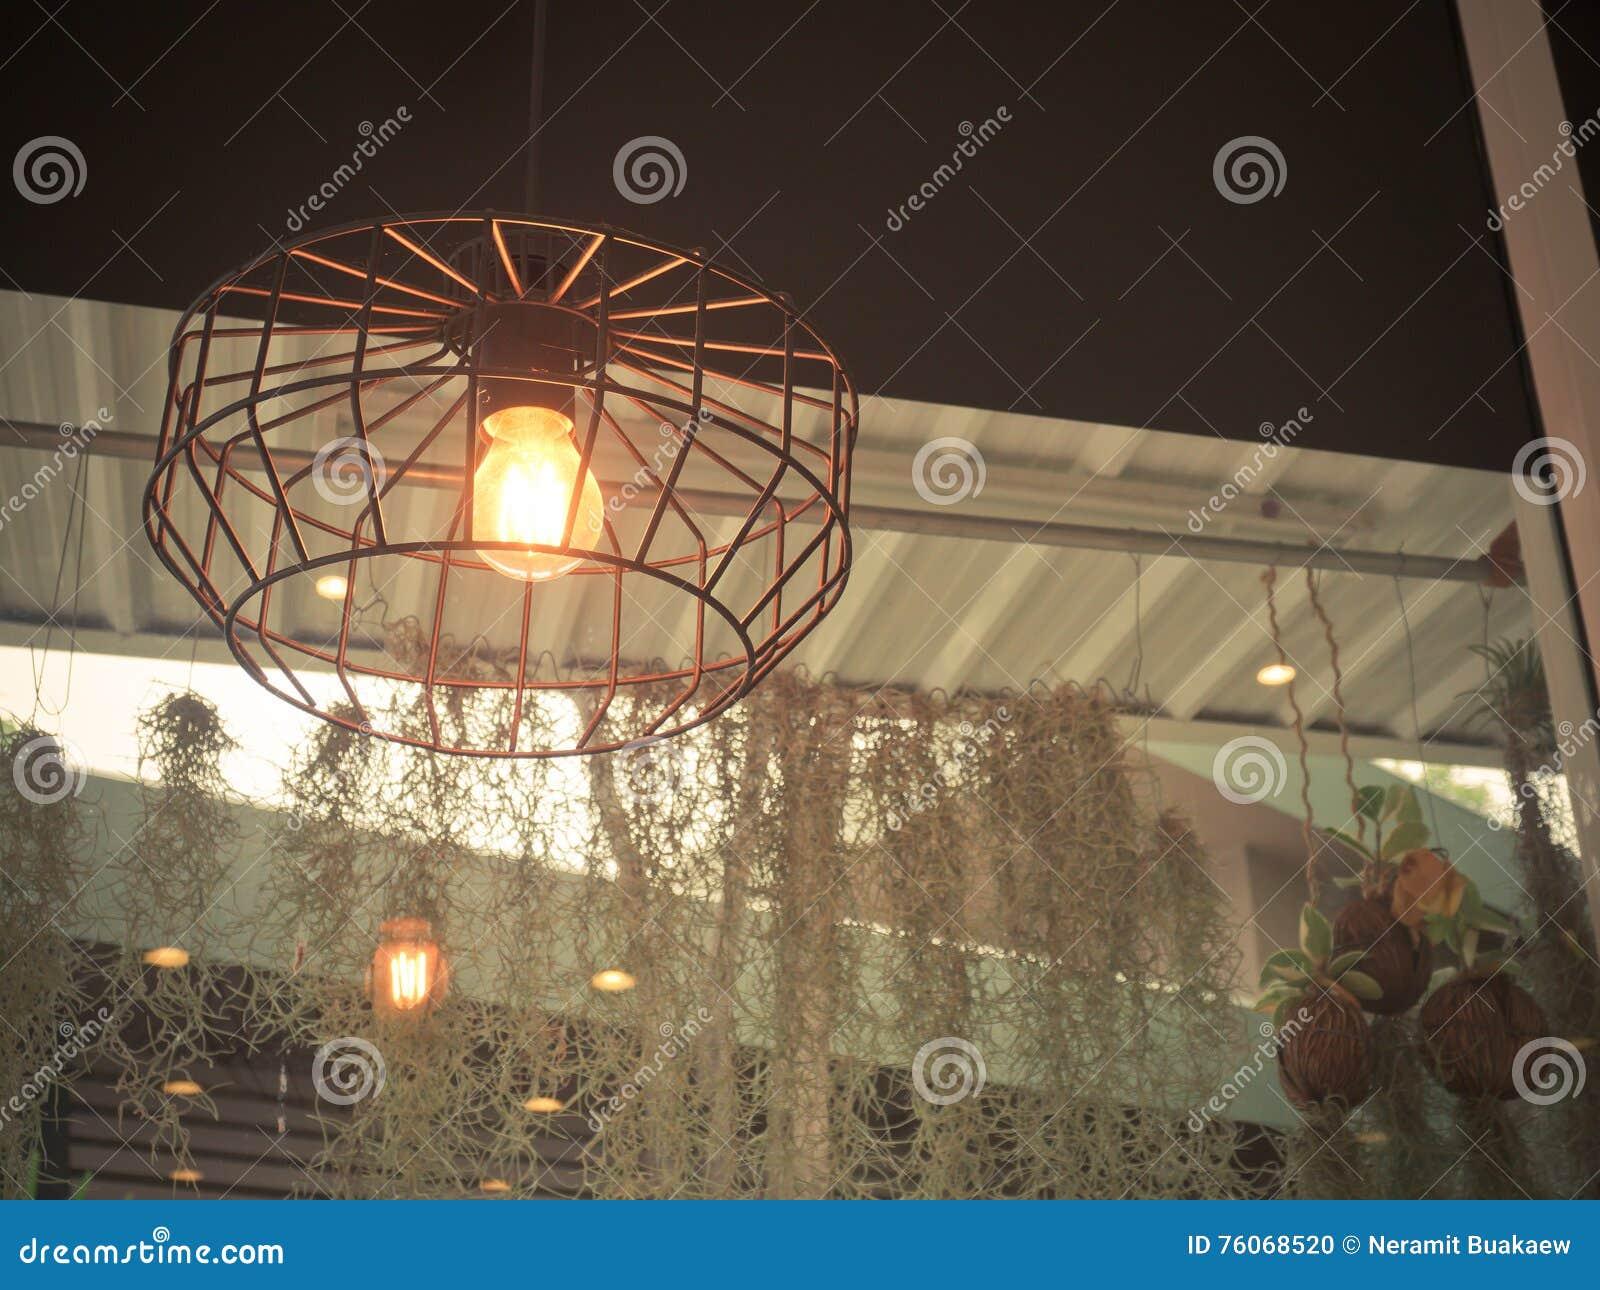 Edisons Glühlampe Und Lampe In Der Modernen Art Warme Glühlampelampe ...